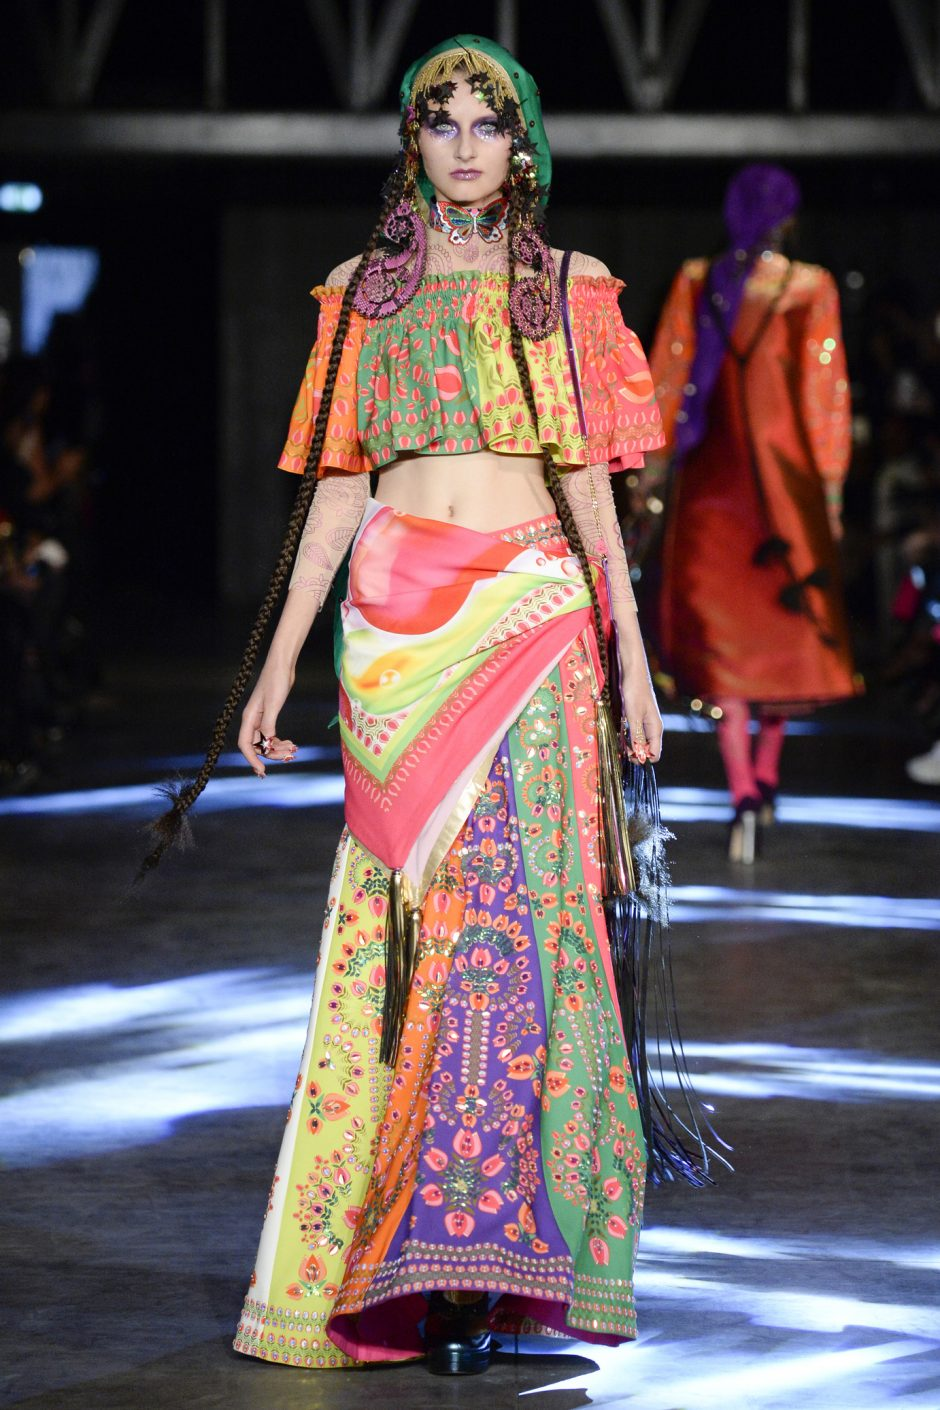 Sparkle 136 Disco Gypsy At Paris Fashion Week Pumpernickel Pixie